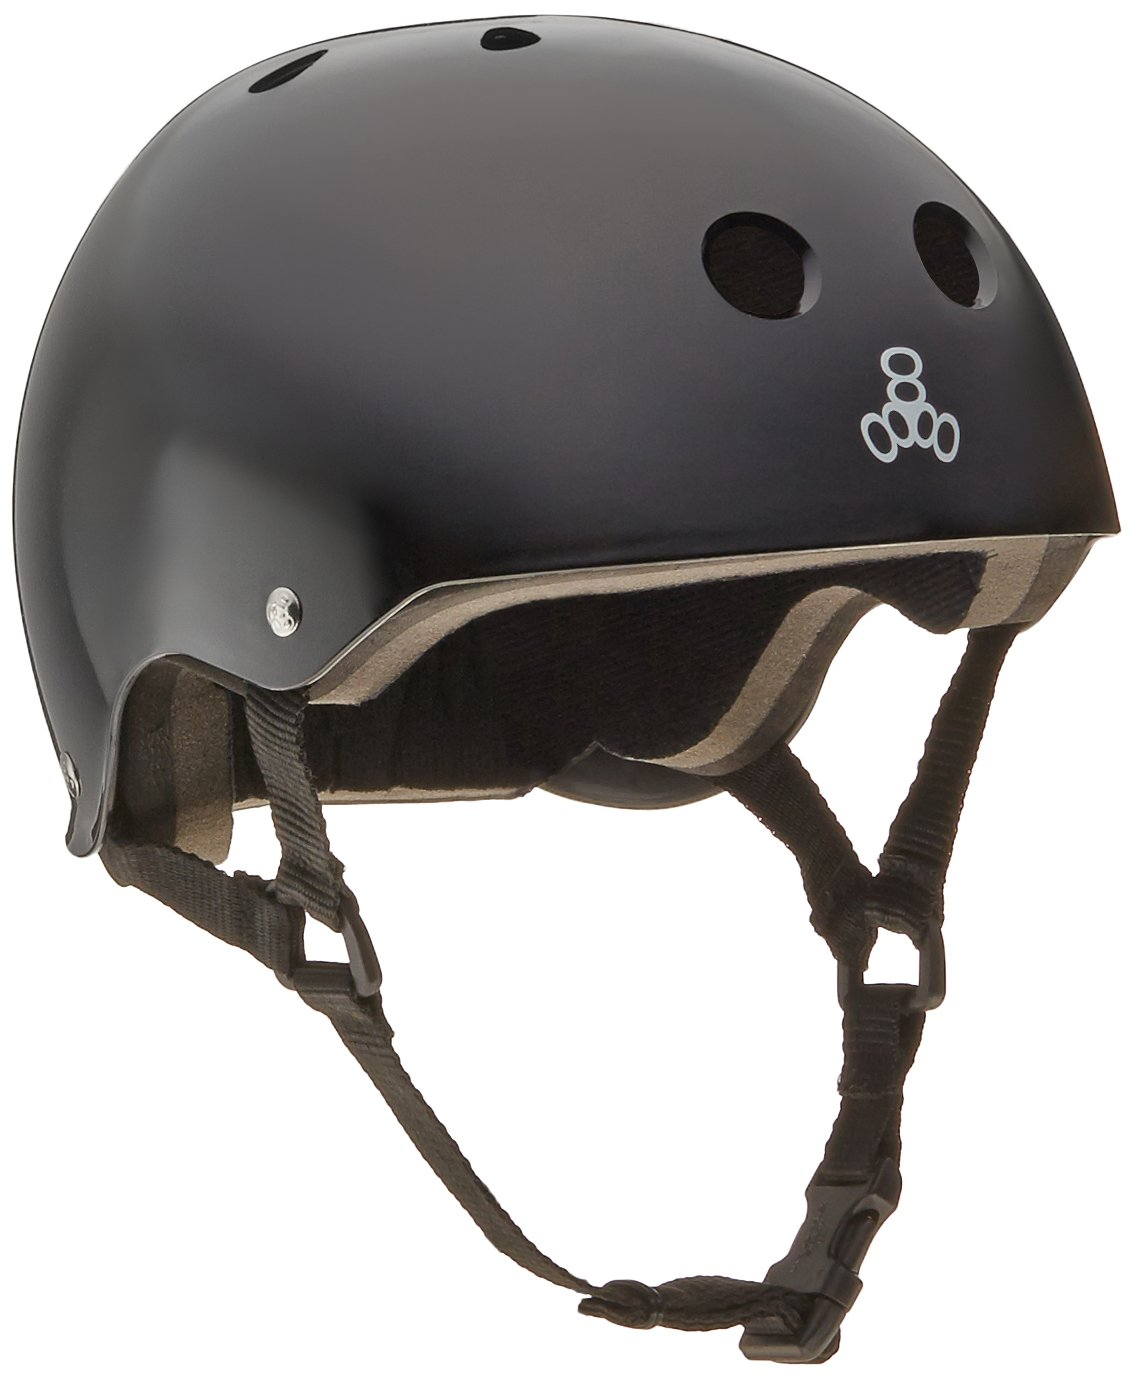 Triple 8 Brainsaver Glossy Helmet with Standard Liner (Black Gloss, Medium)